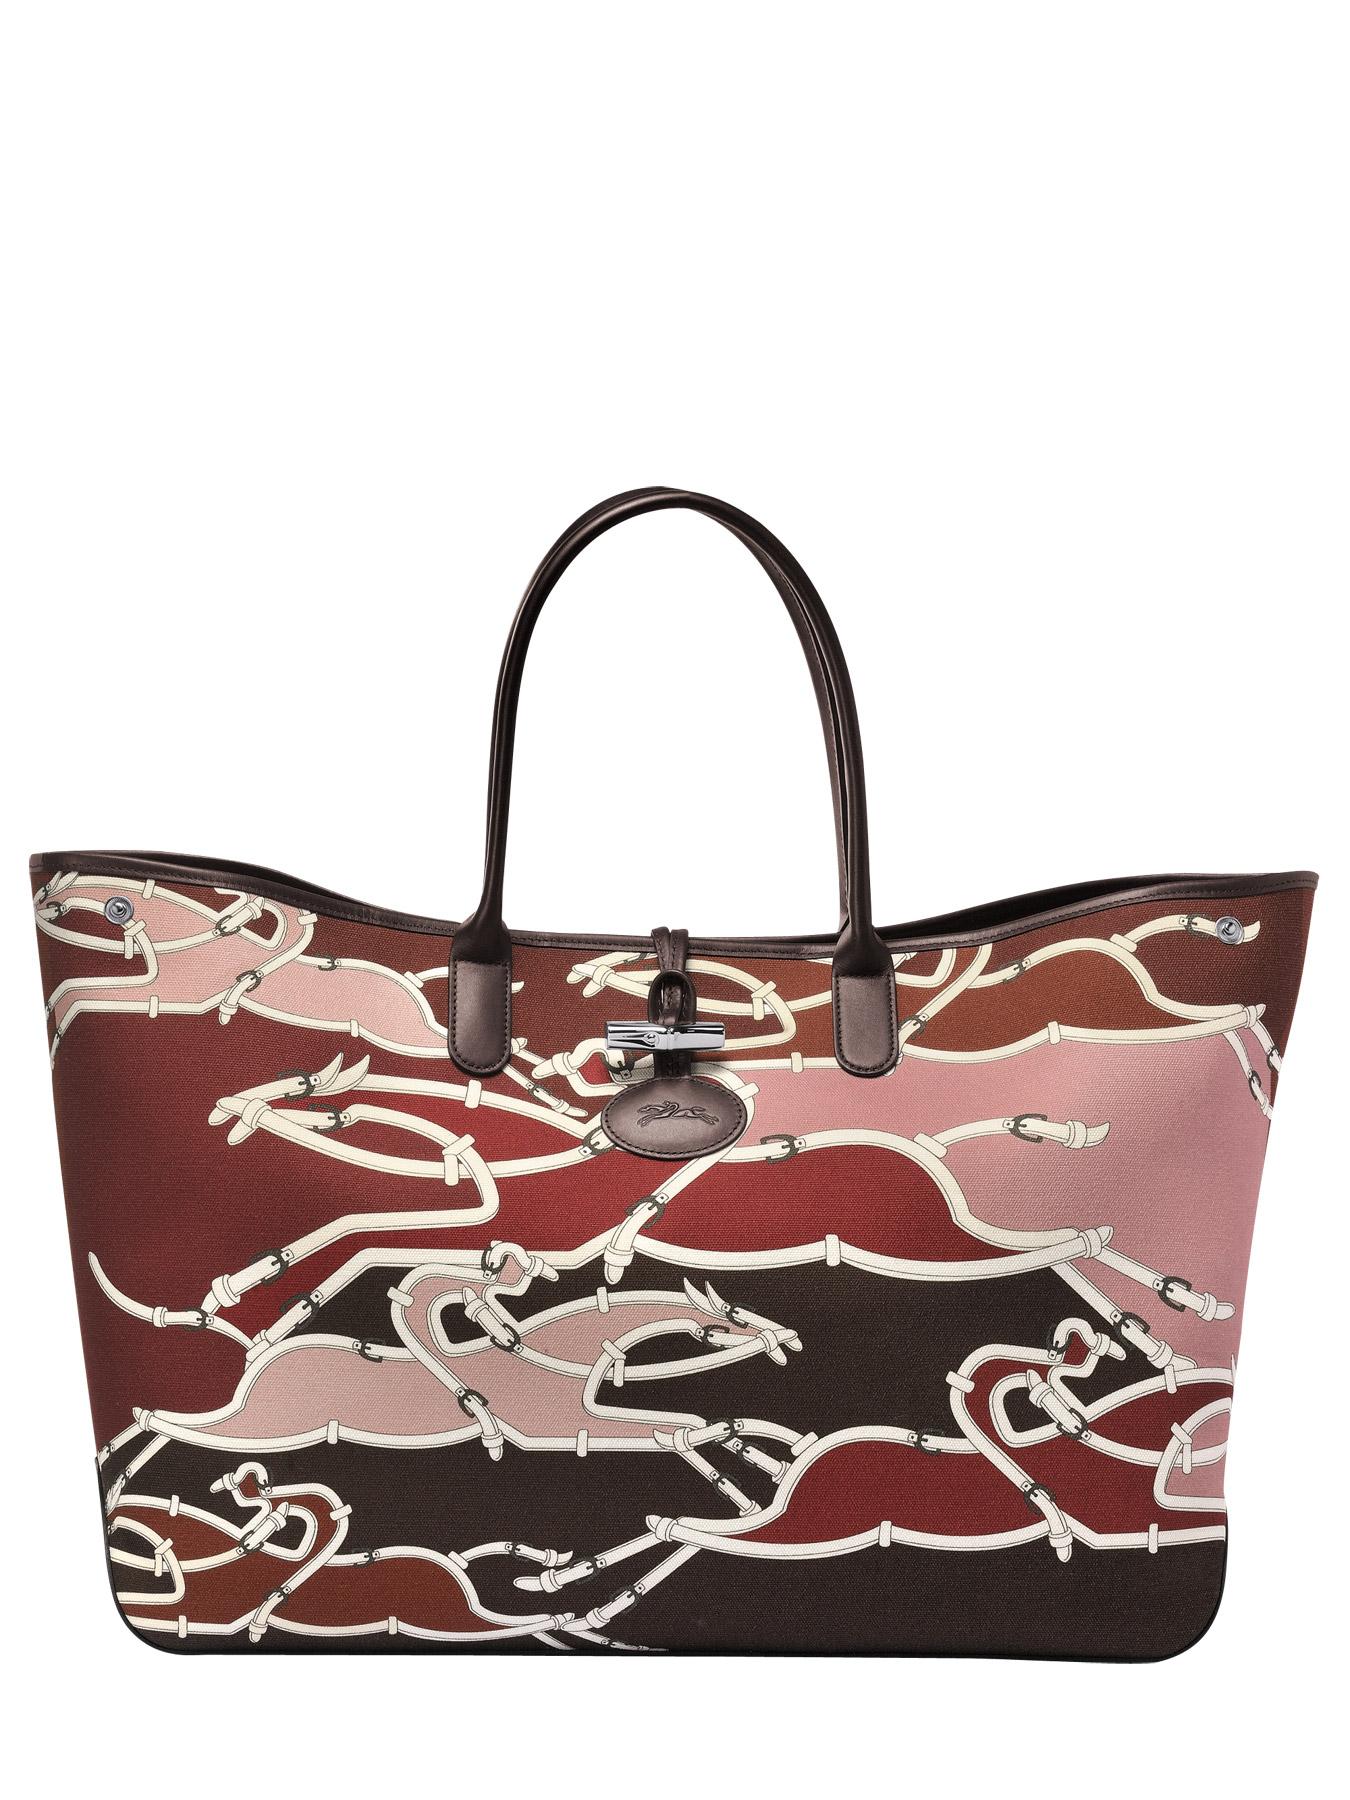 Longchamp Handbag 1369682 - best prices 3017d78342